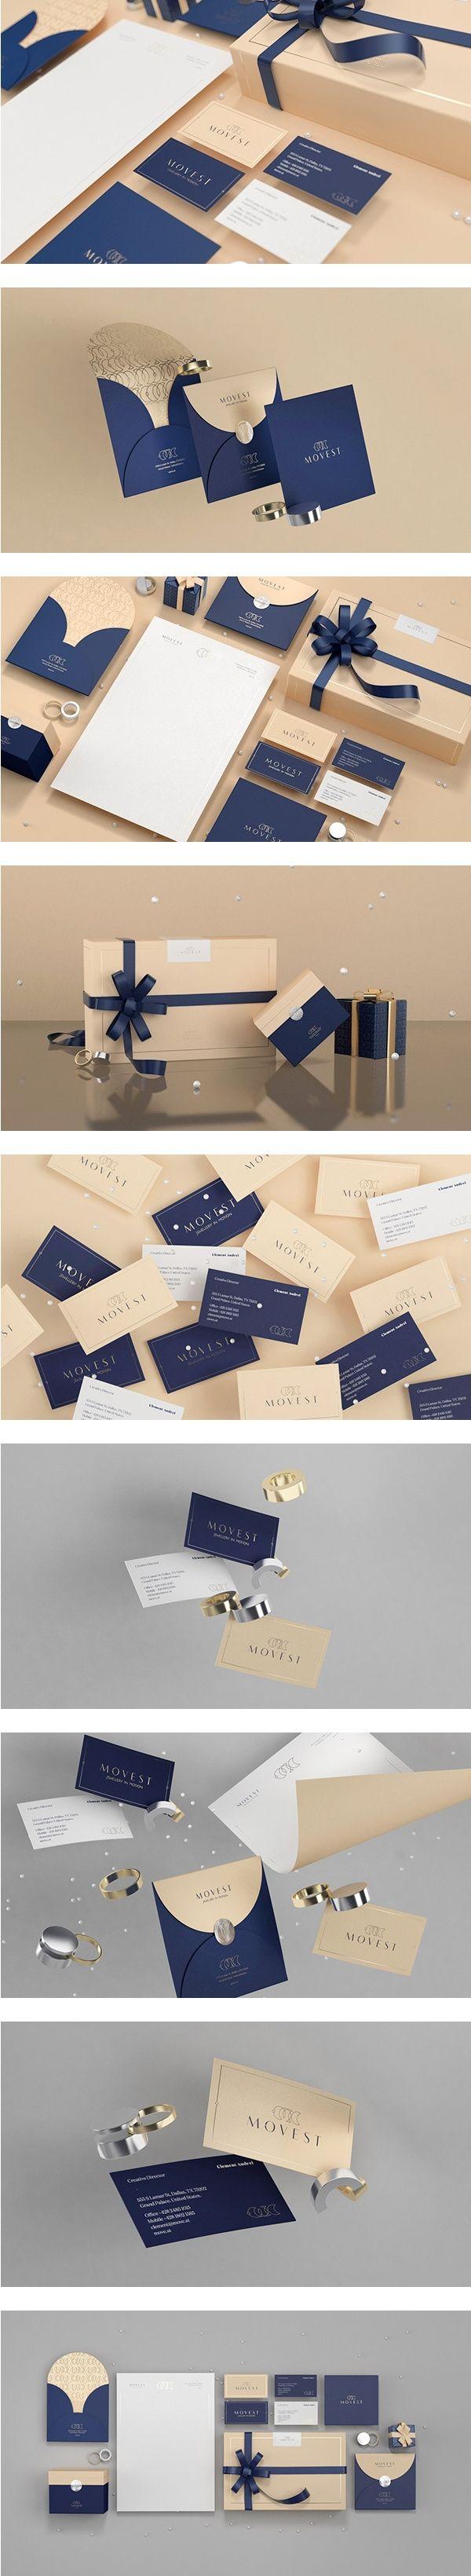 Movest Jewelry Branding | Fivestar Branding – Design and Branding Agency & Inspiration Gallery